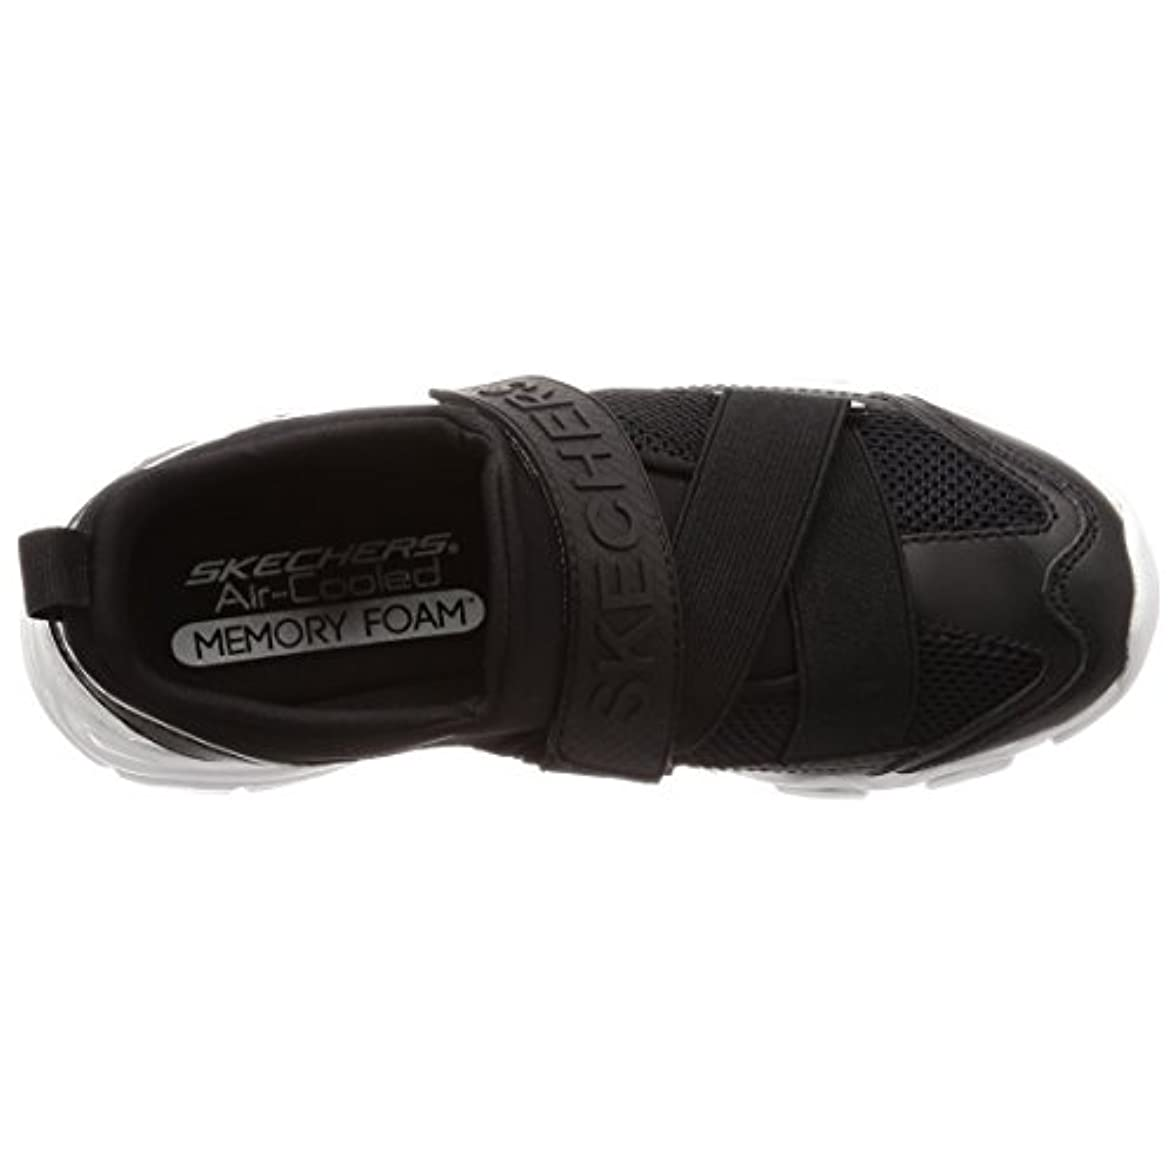 Scarpa Donna Skechers Fast Look 88888016 Blk Nero